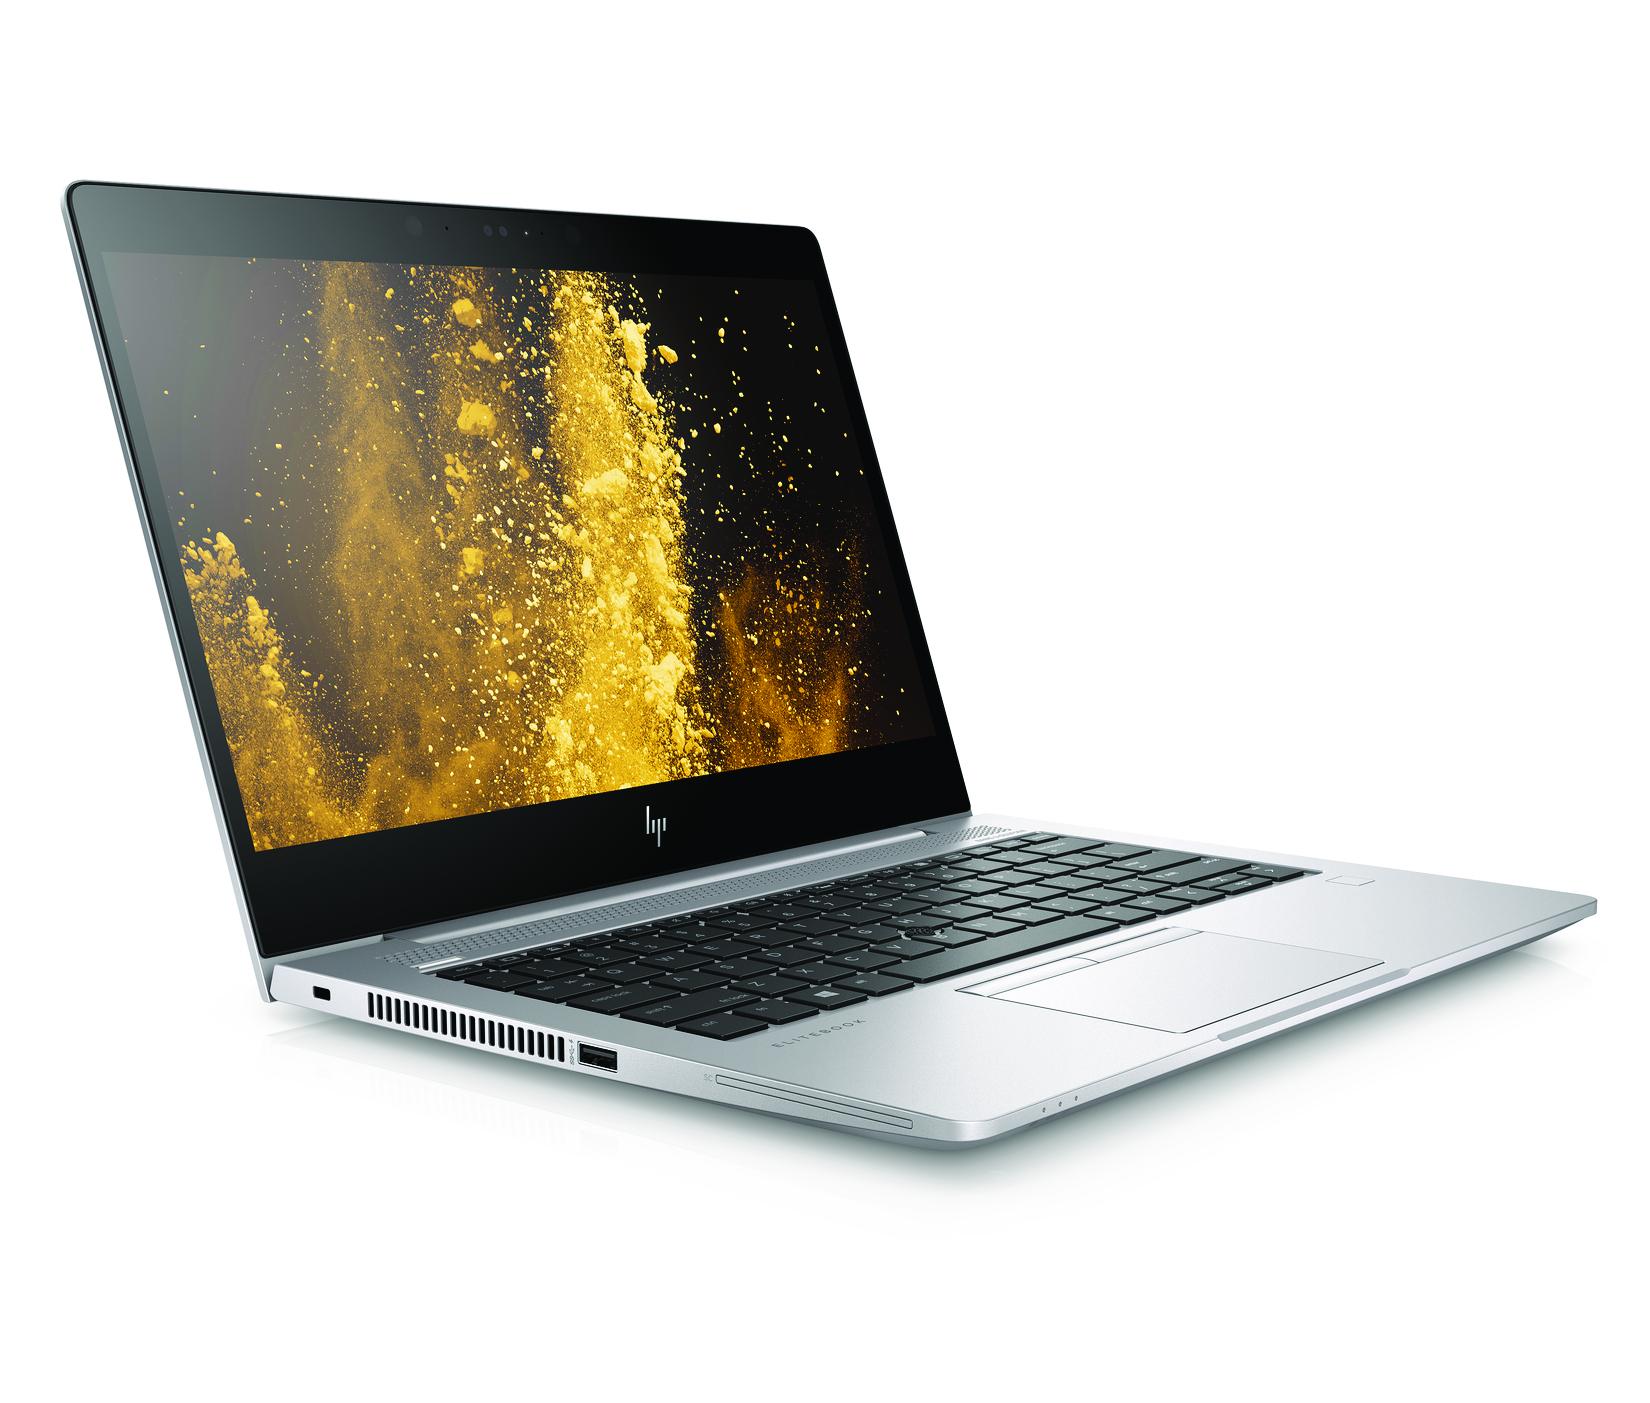 HP Sure View を搭載した HP EliteBook 830 G5